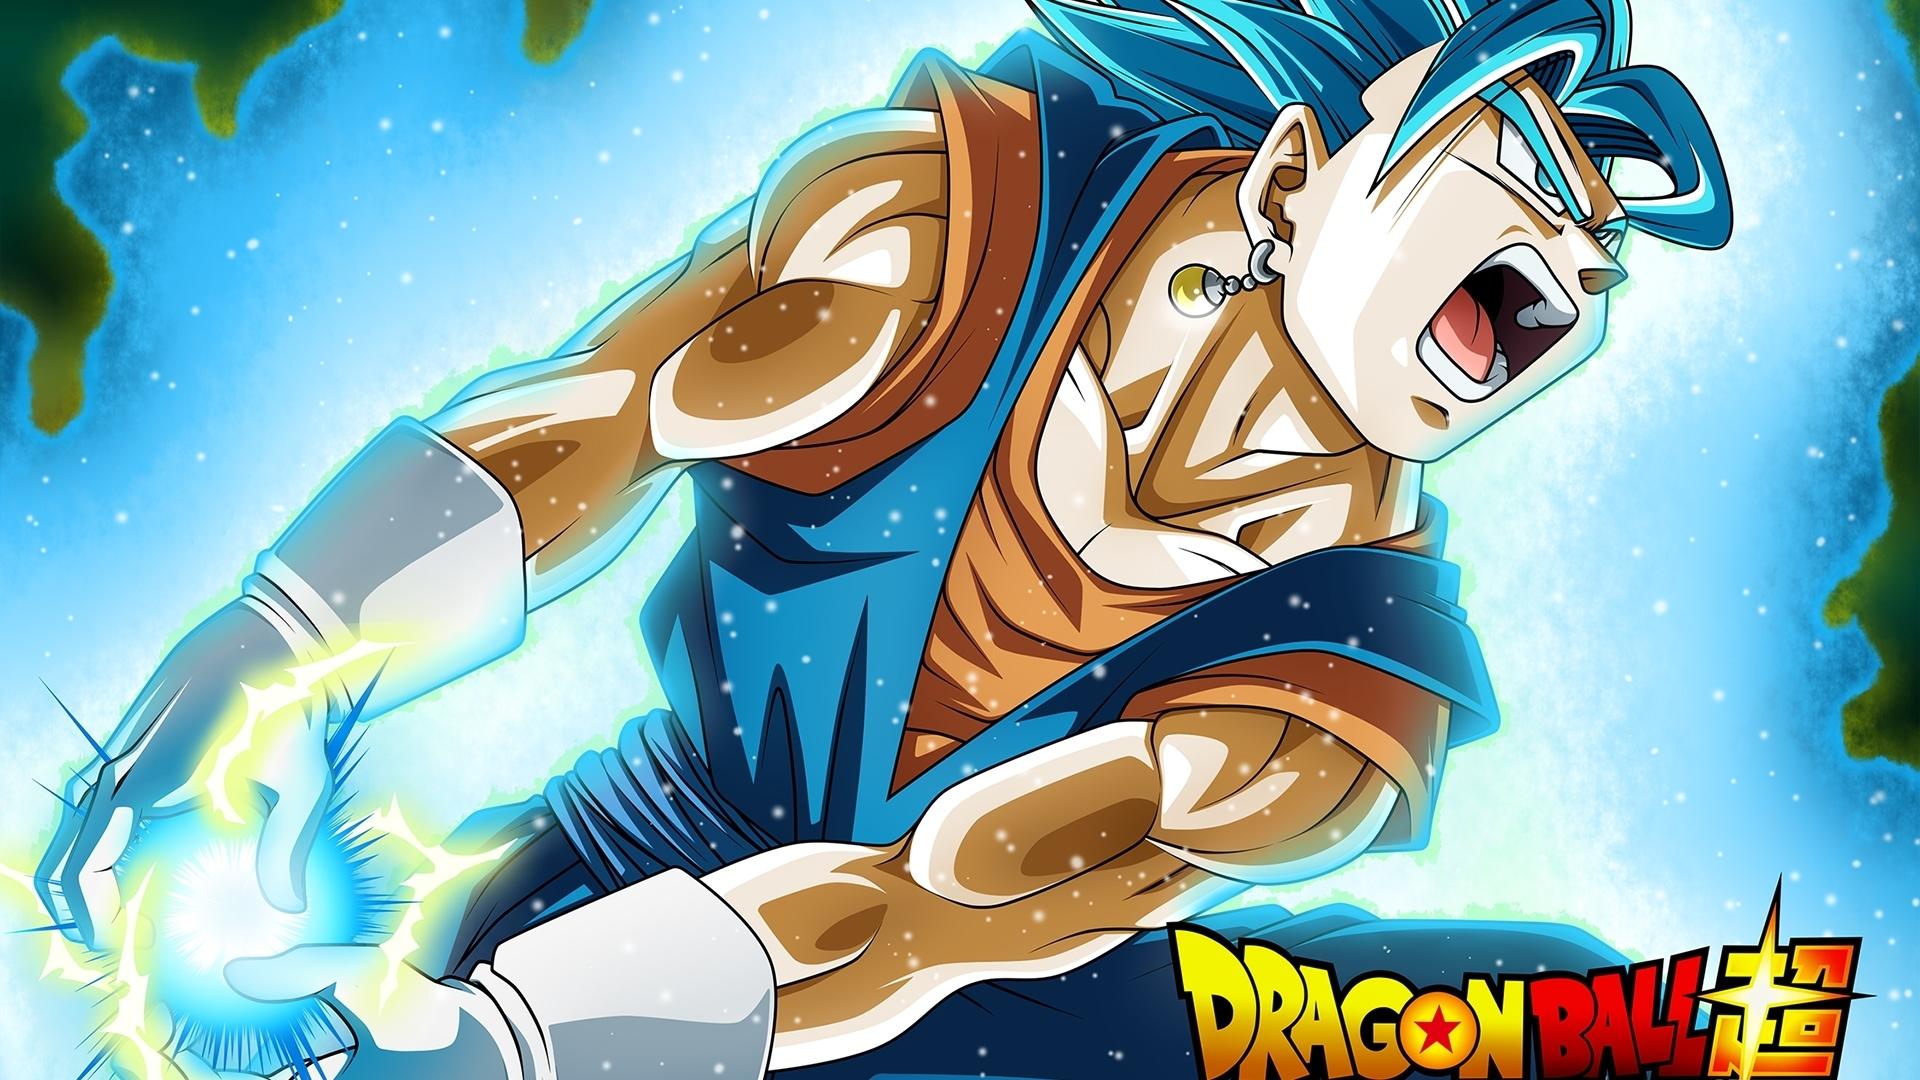 vegito super saiyan blue dragon ball wallpaper #42324